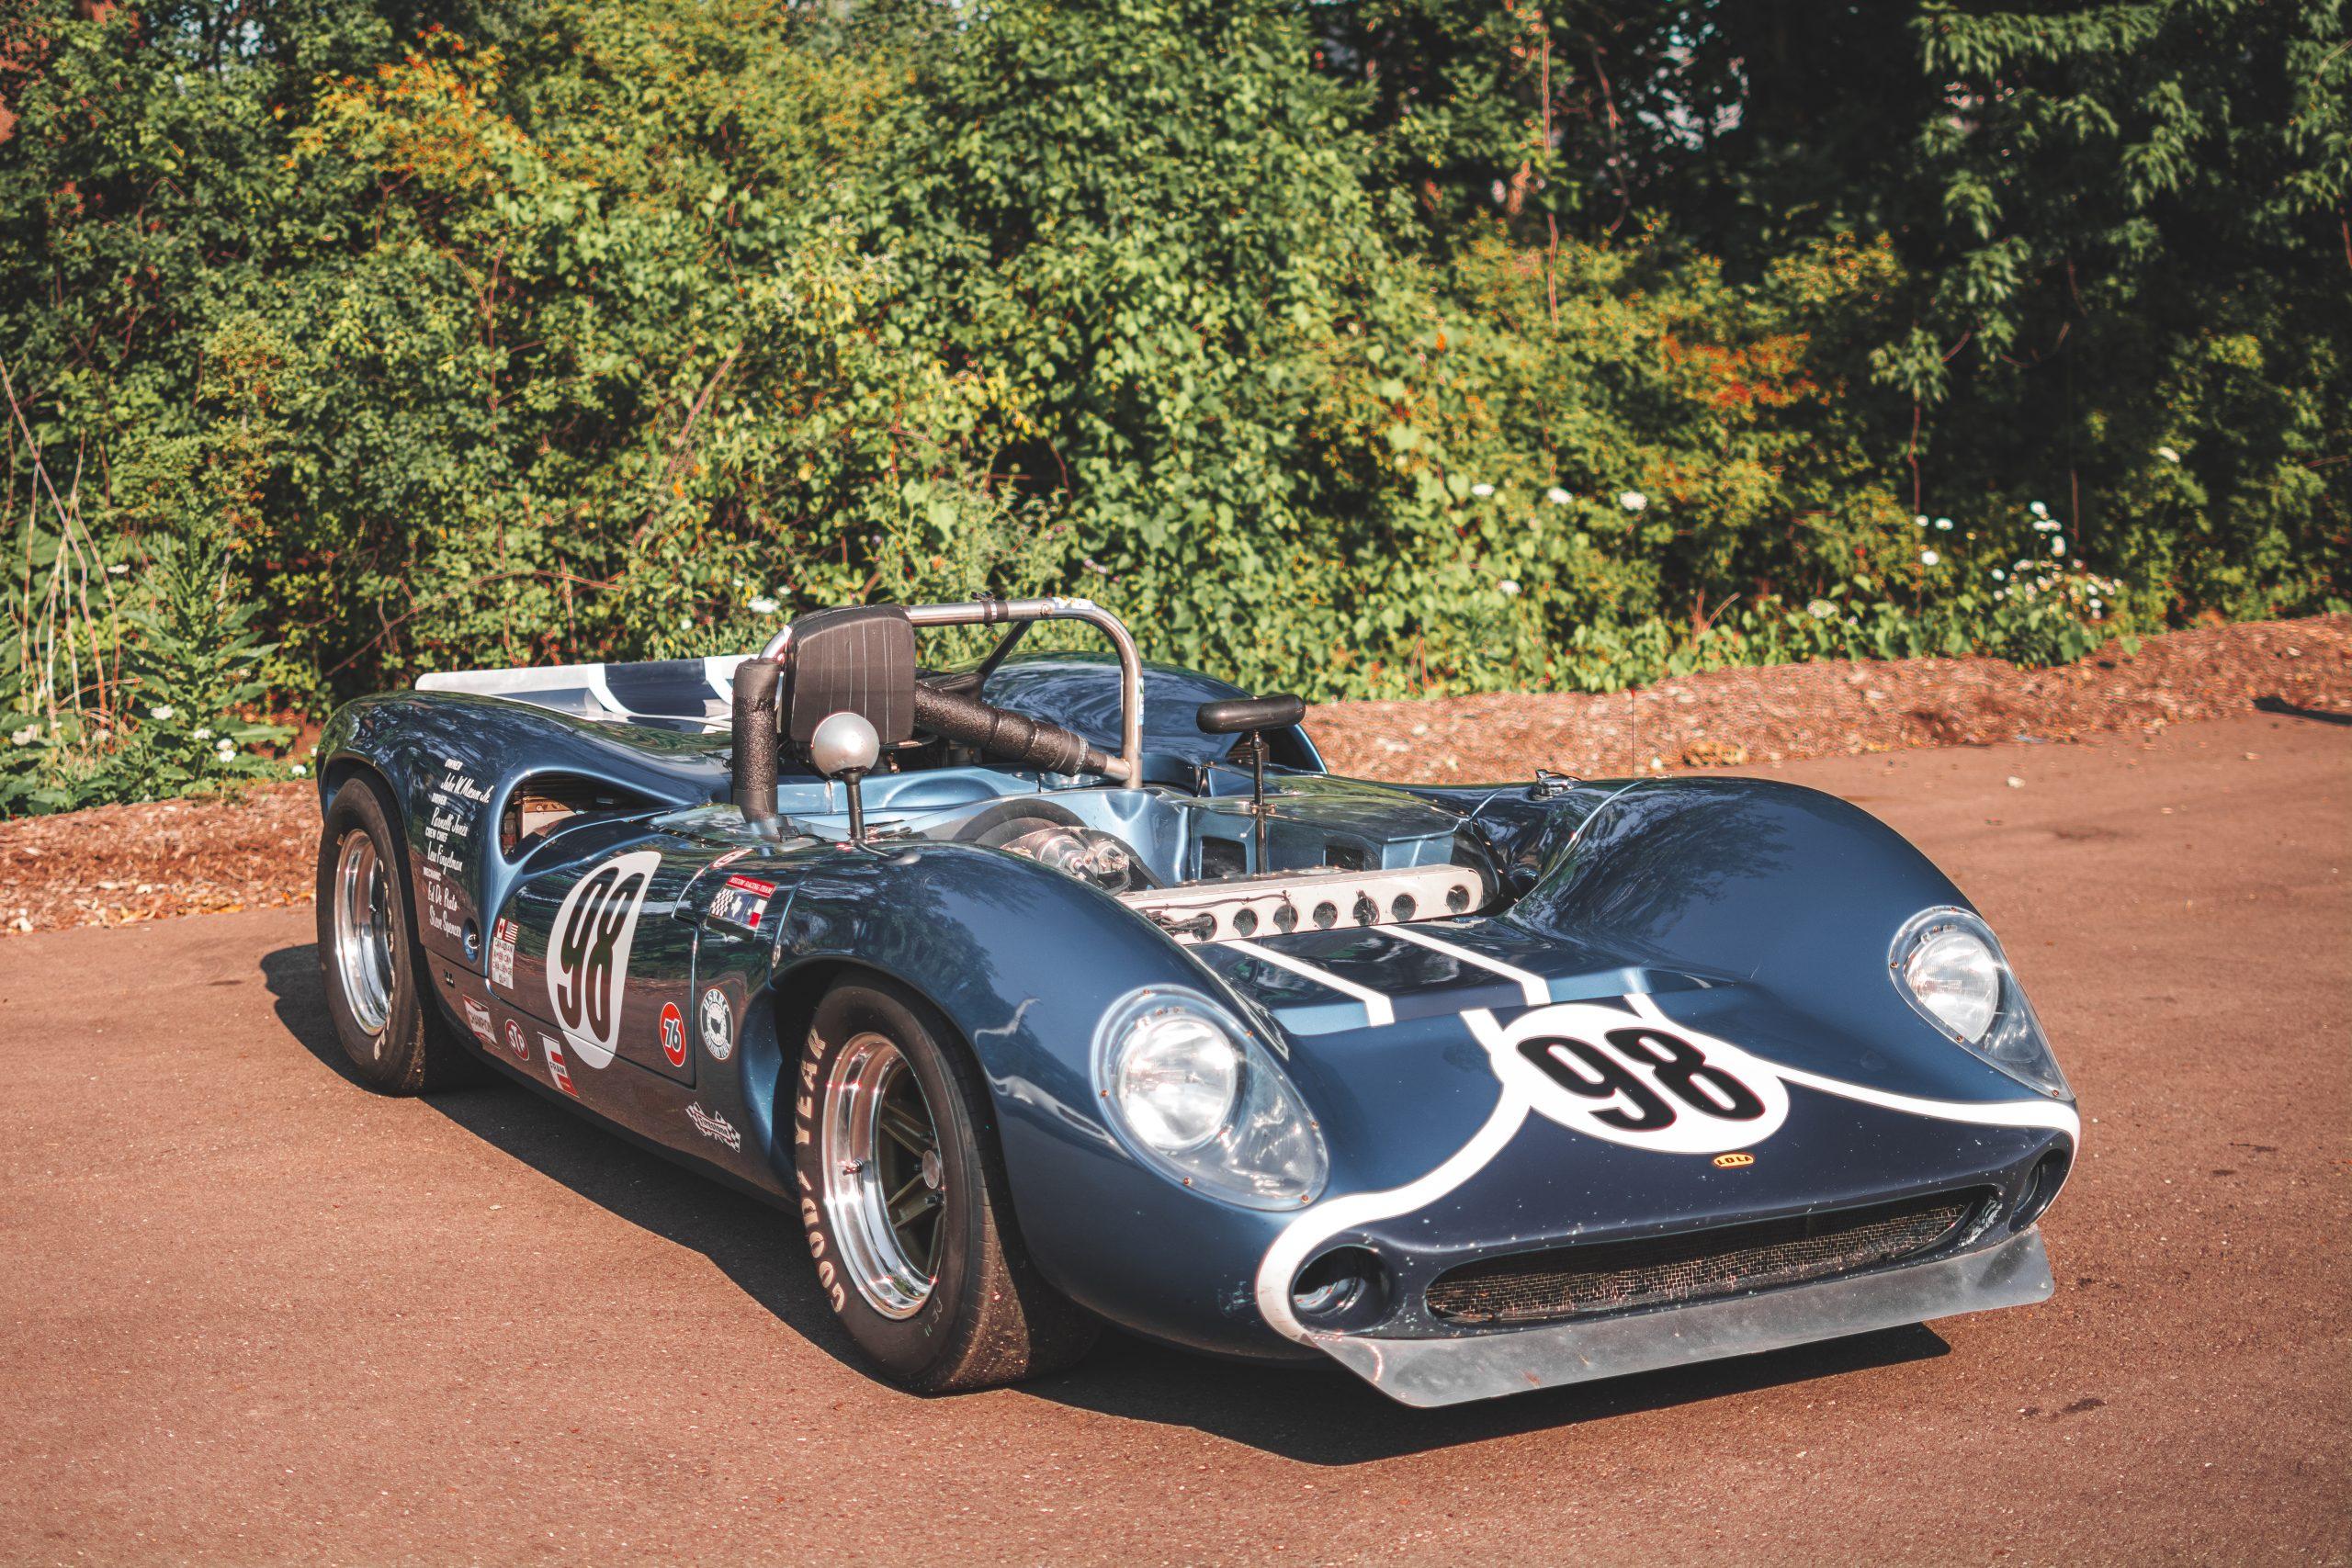 1966 Parnelli Jones Lola T70 MK II